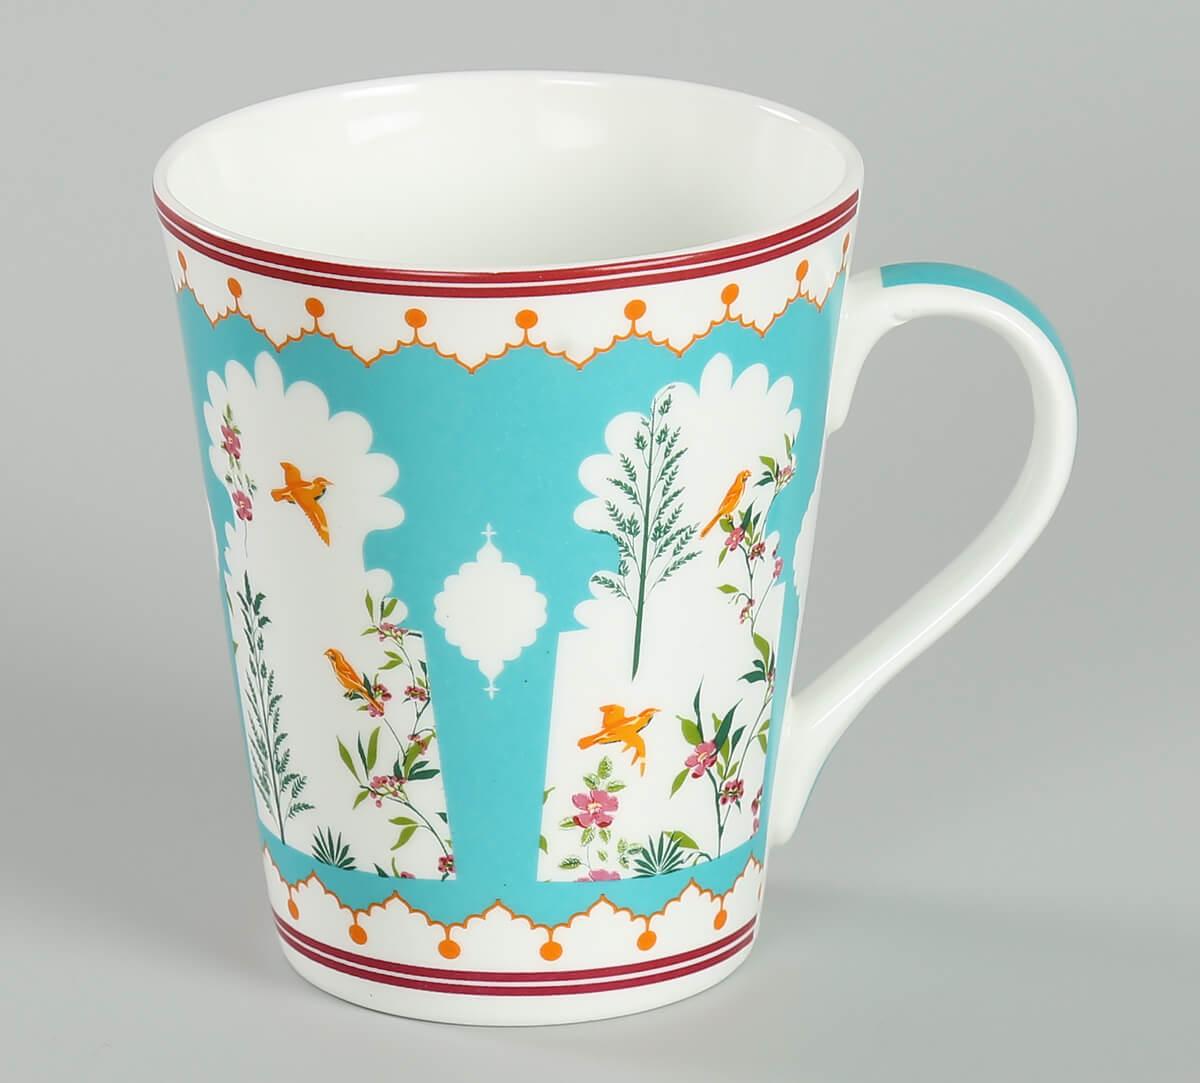 Windows of Wisdom Zing Mug Set of 2